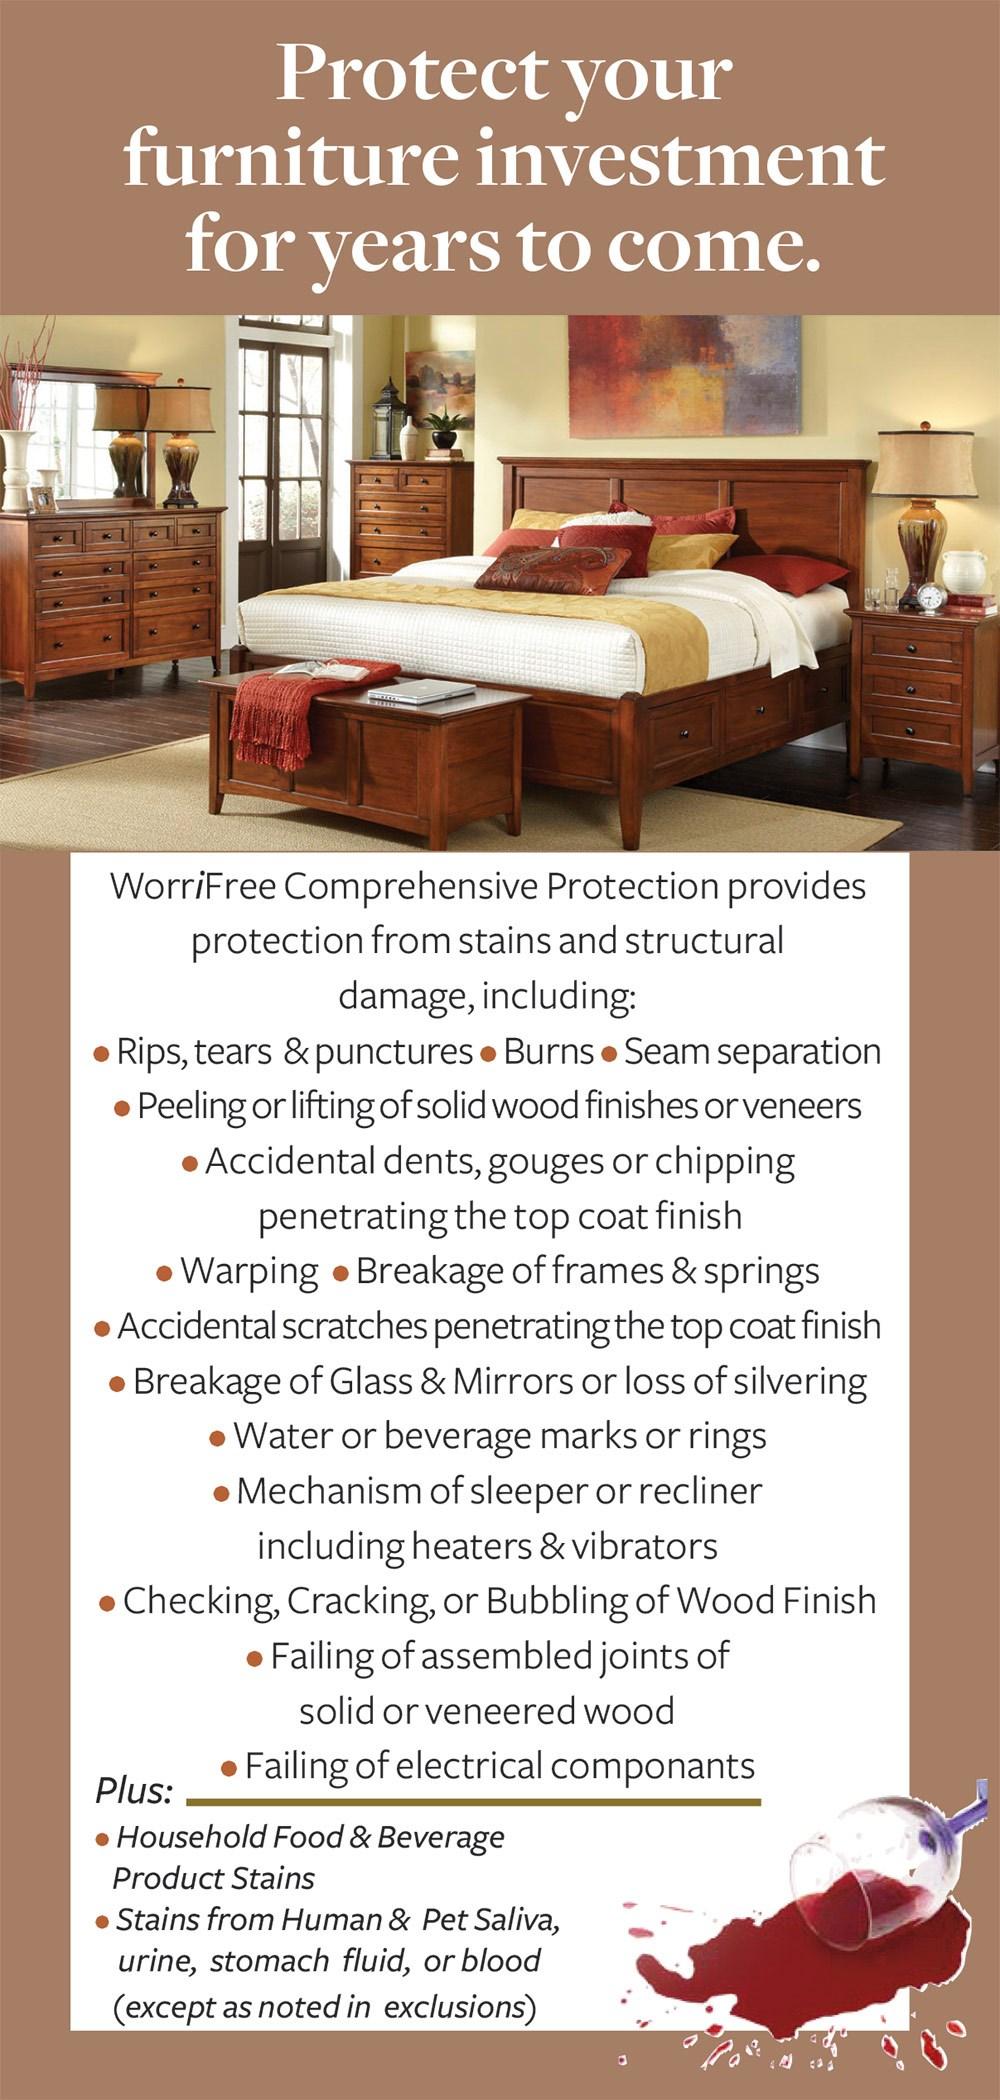 Worri Free Protection Plan Info 2